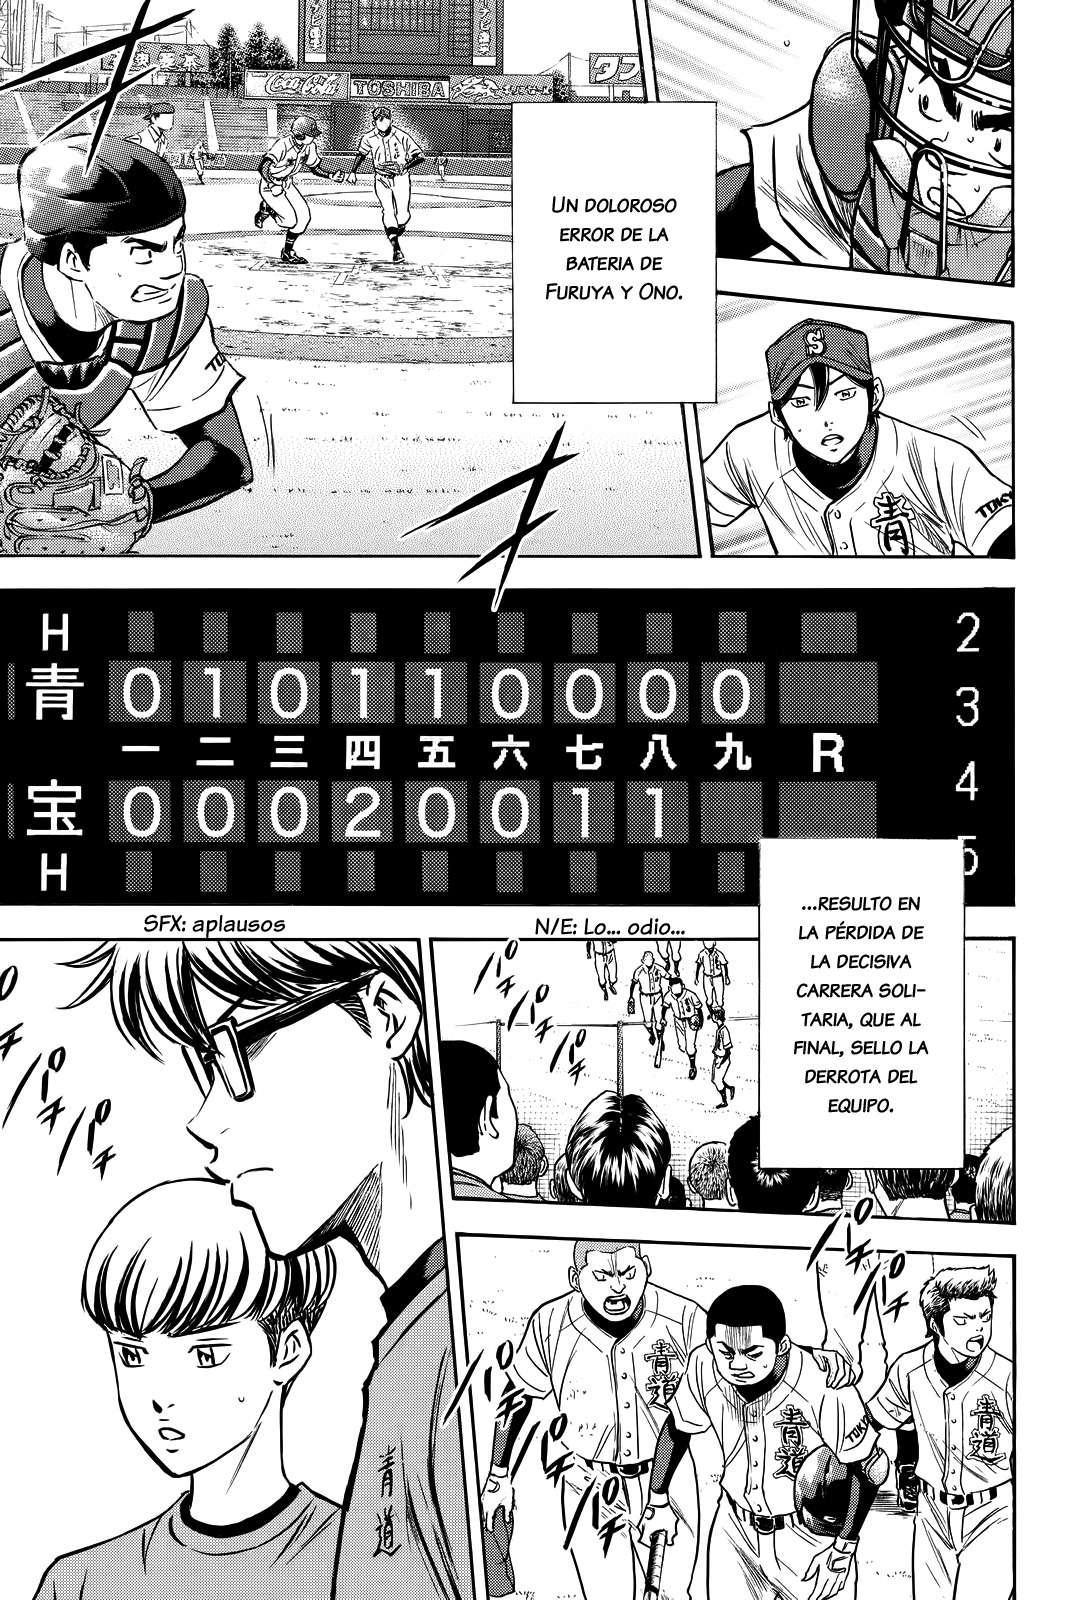 http://c5.ninemanga.com/es_manga/24/1752/430810/50fa8b7beb11549c9416ffdf6b21177c.jpg Page 9